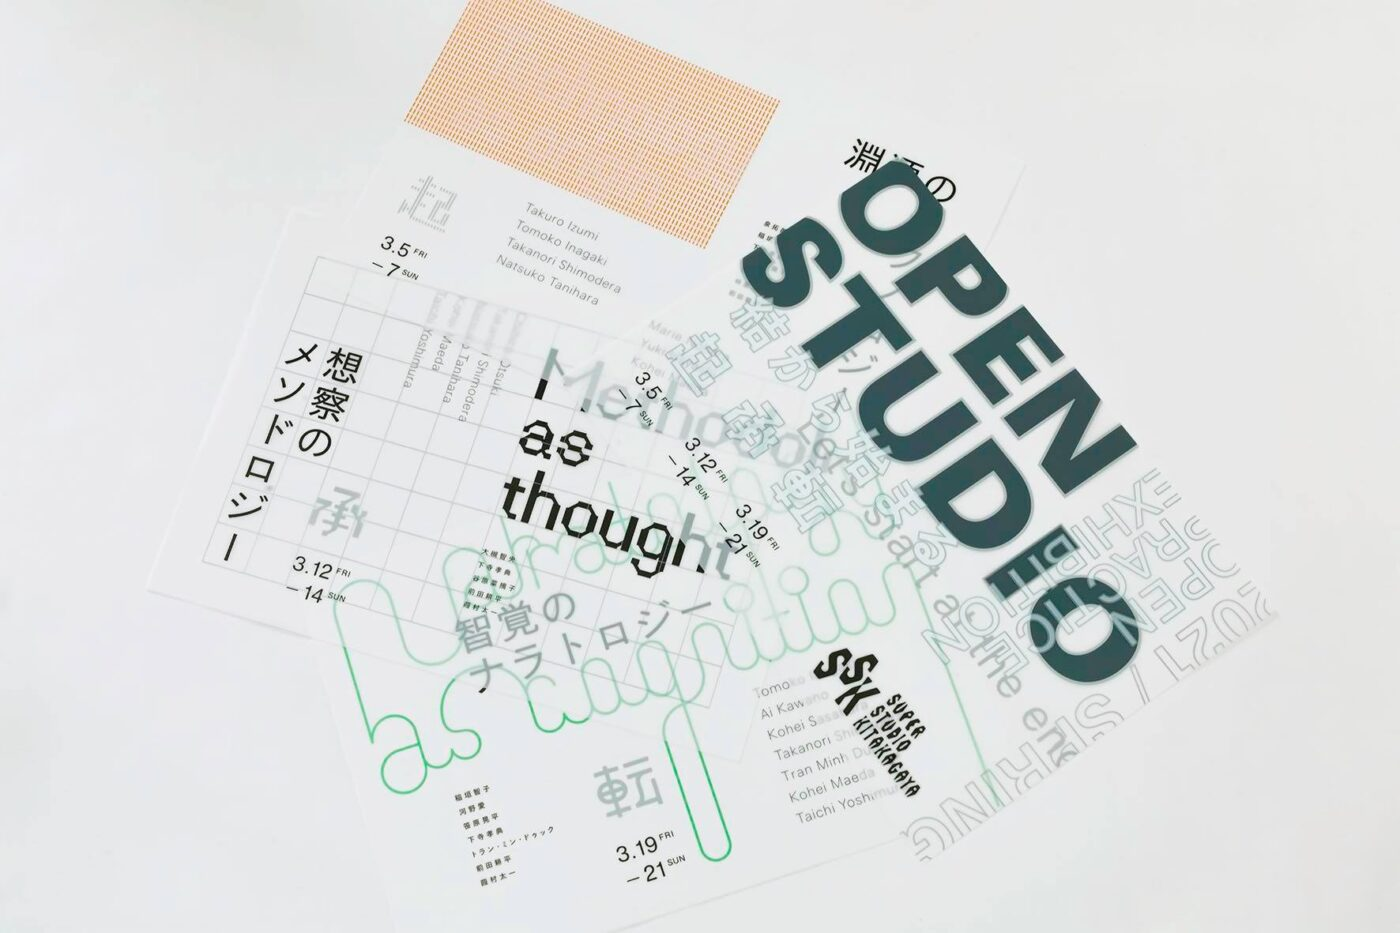 REVIEW|Super Studio Kitakagaya(SSK)、展示、収蔵から新しいアートの生産拠点へ